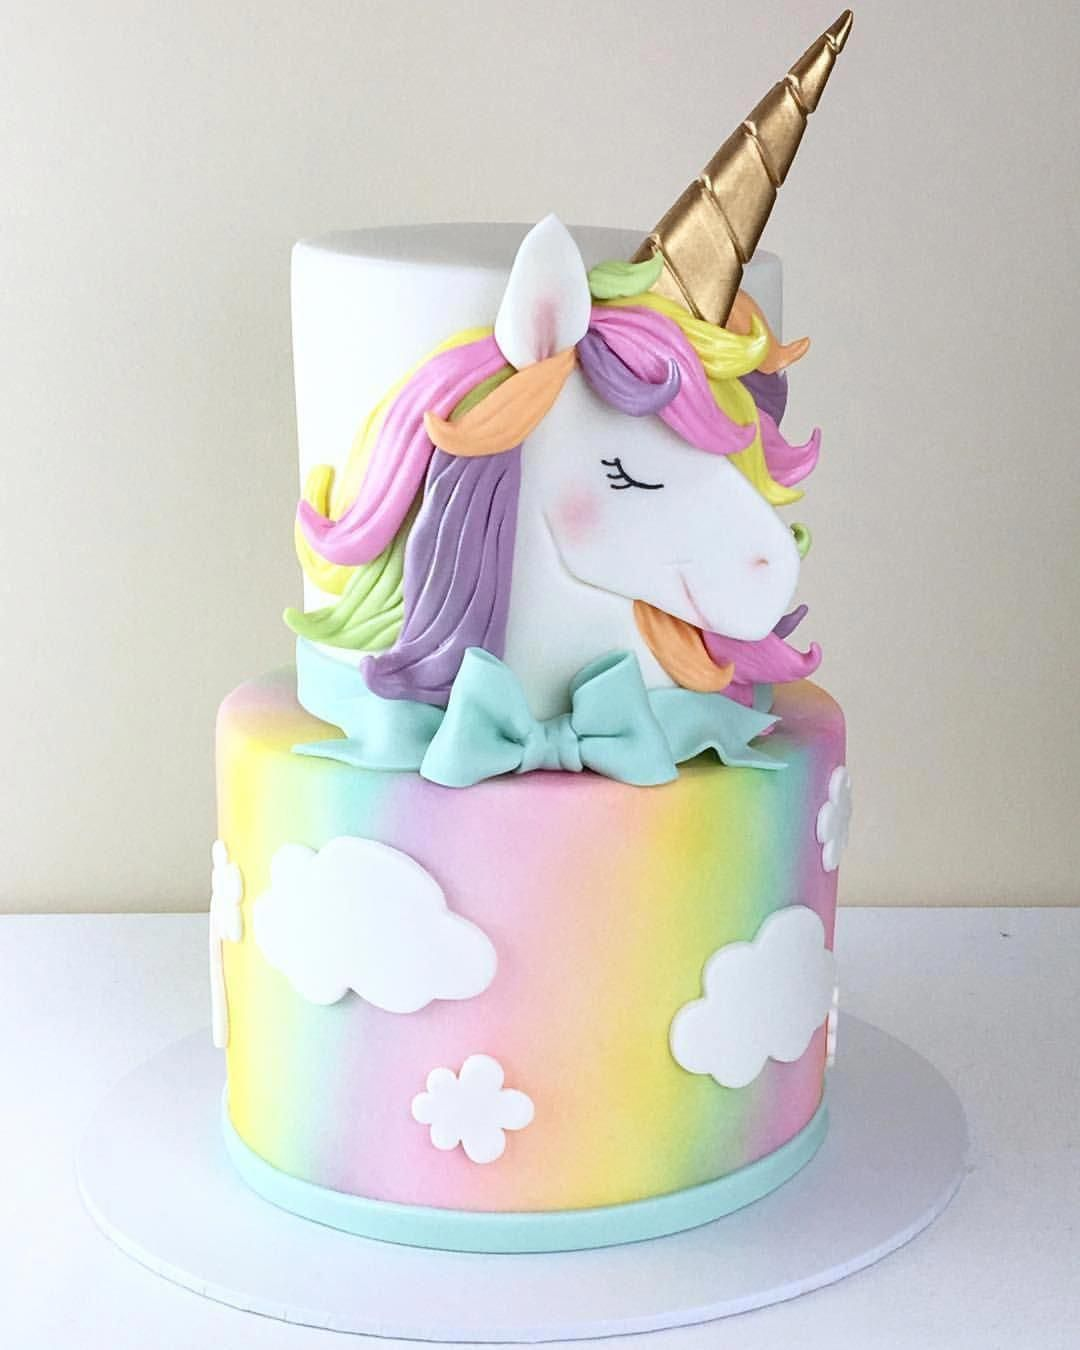 Bundt cake tomato, feta, basil Recipe Unicorn birthday